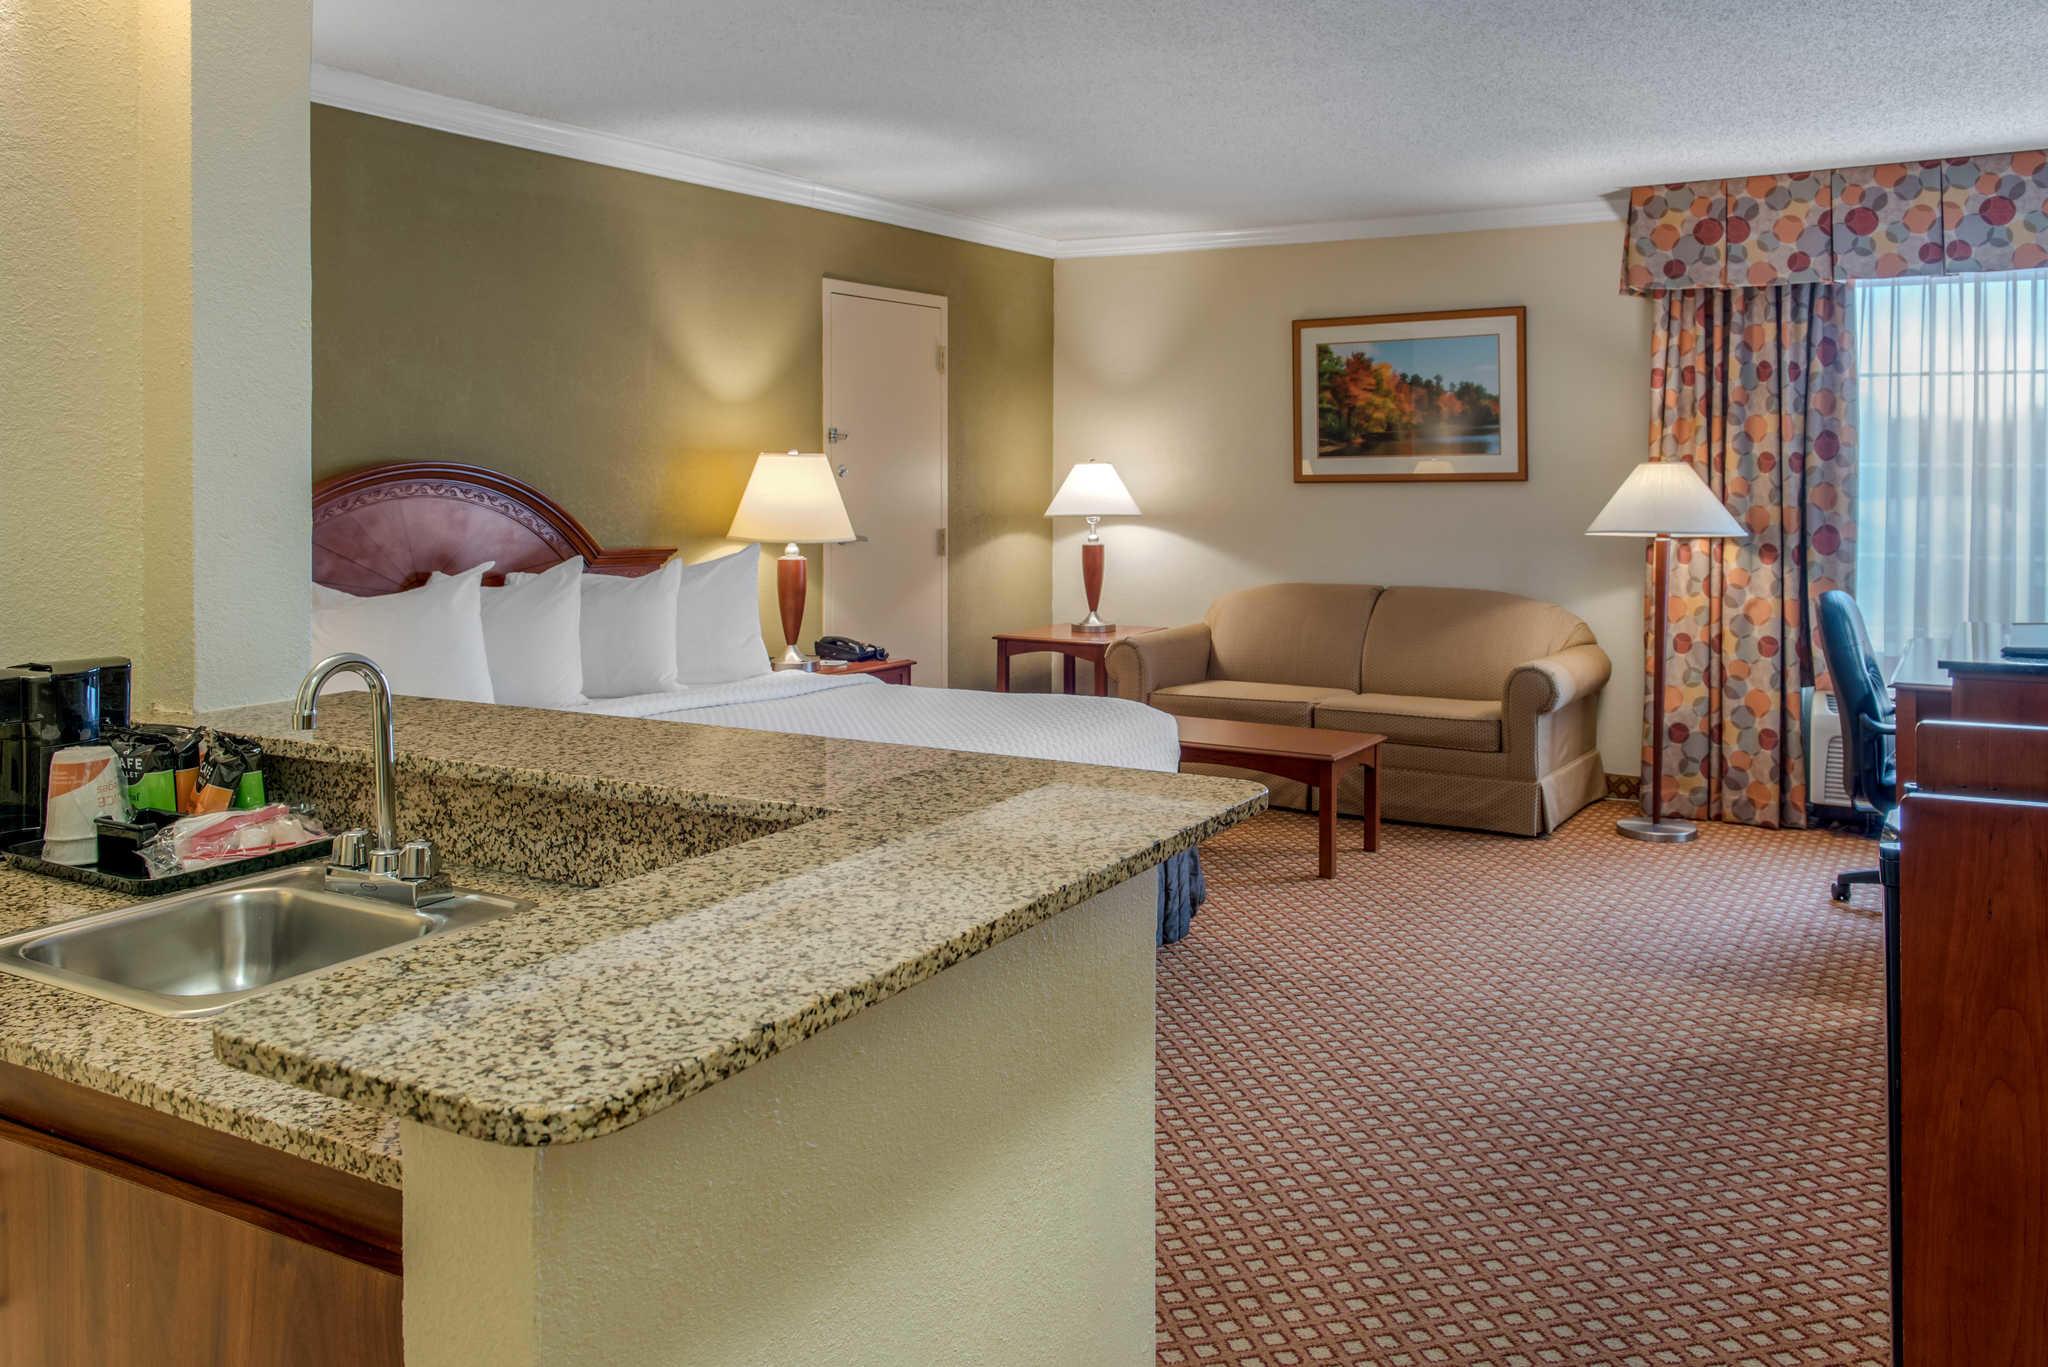 Quality Hotel - Cincinnati Blue Ash image 17